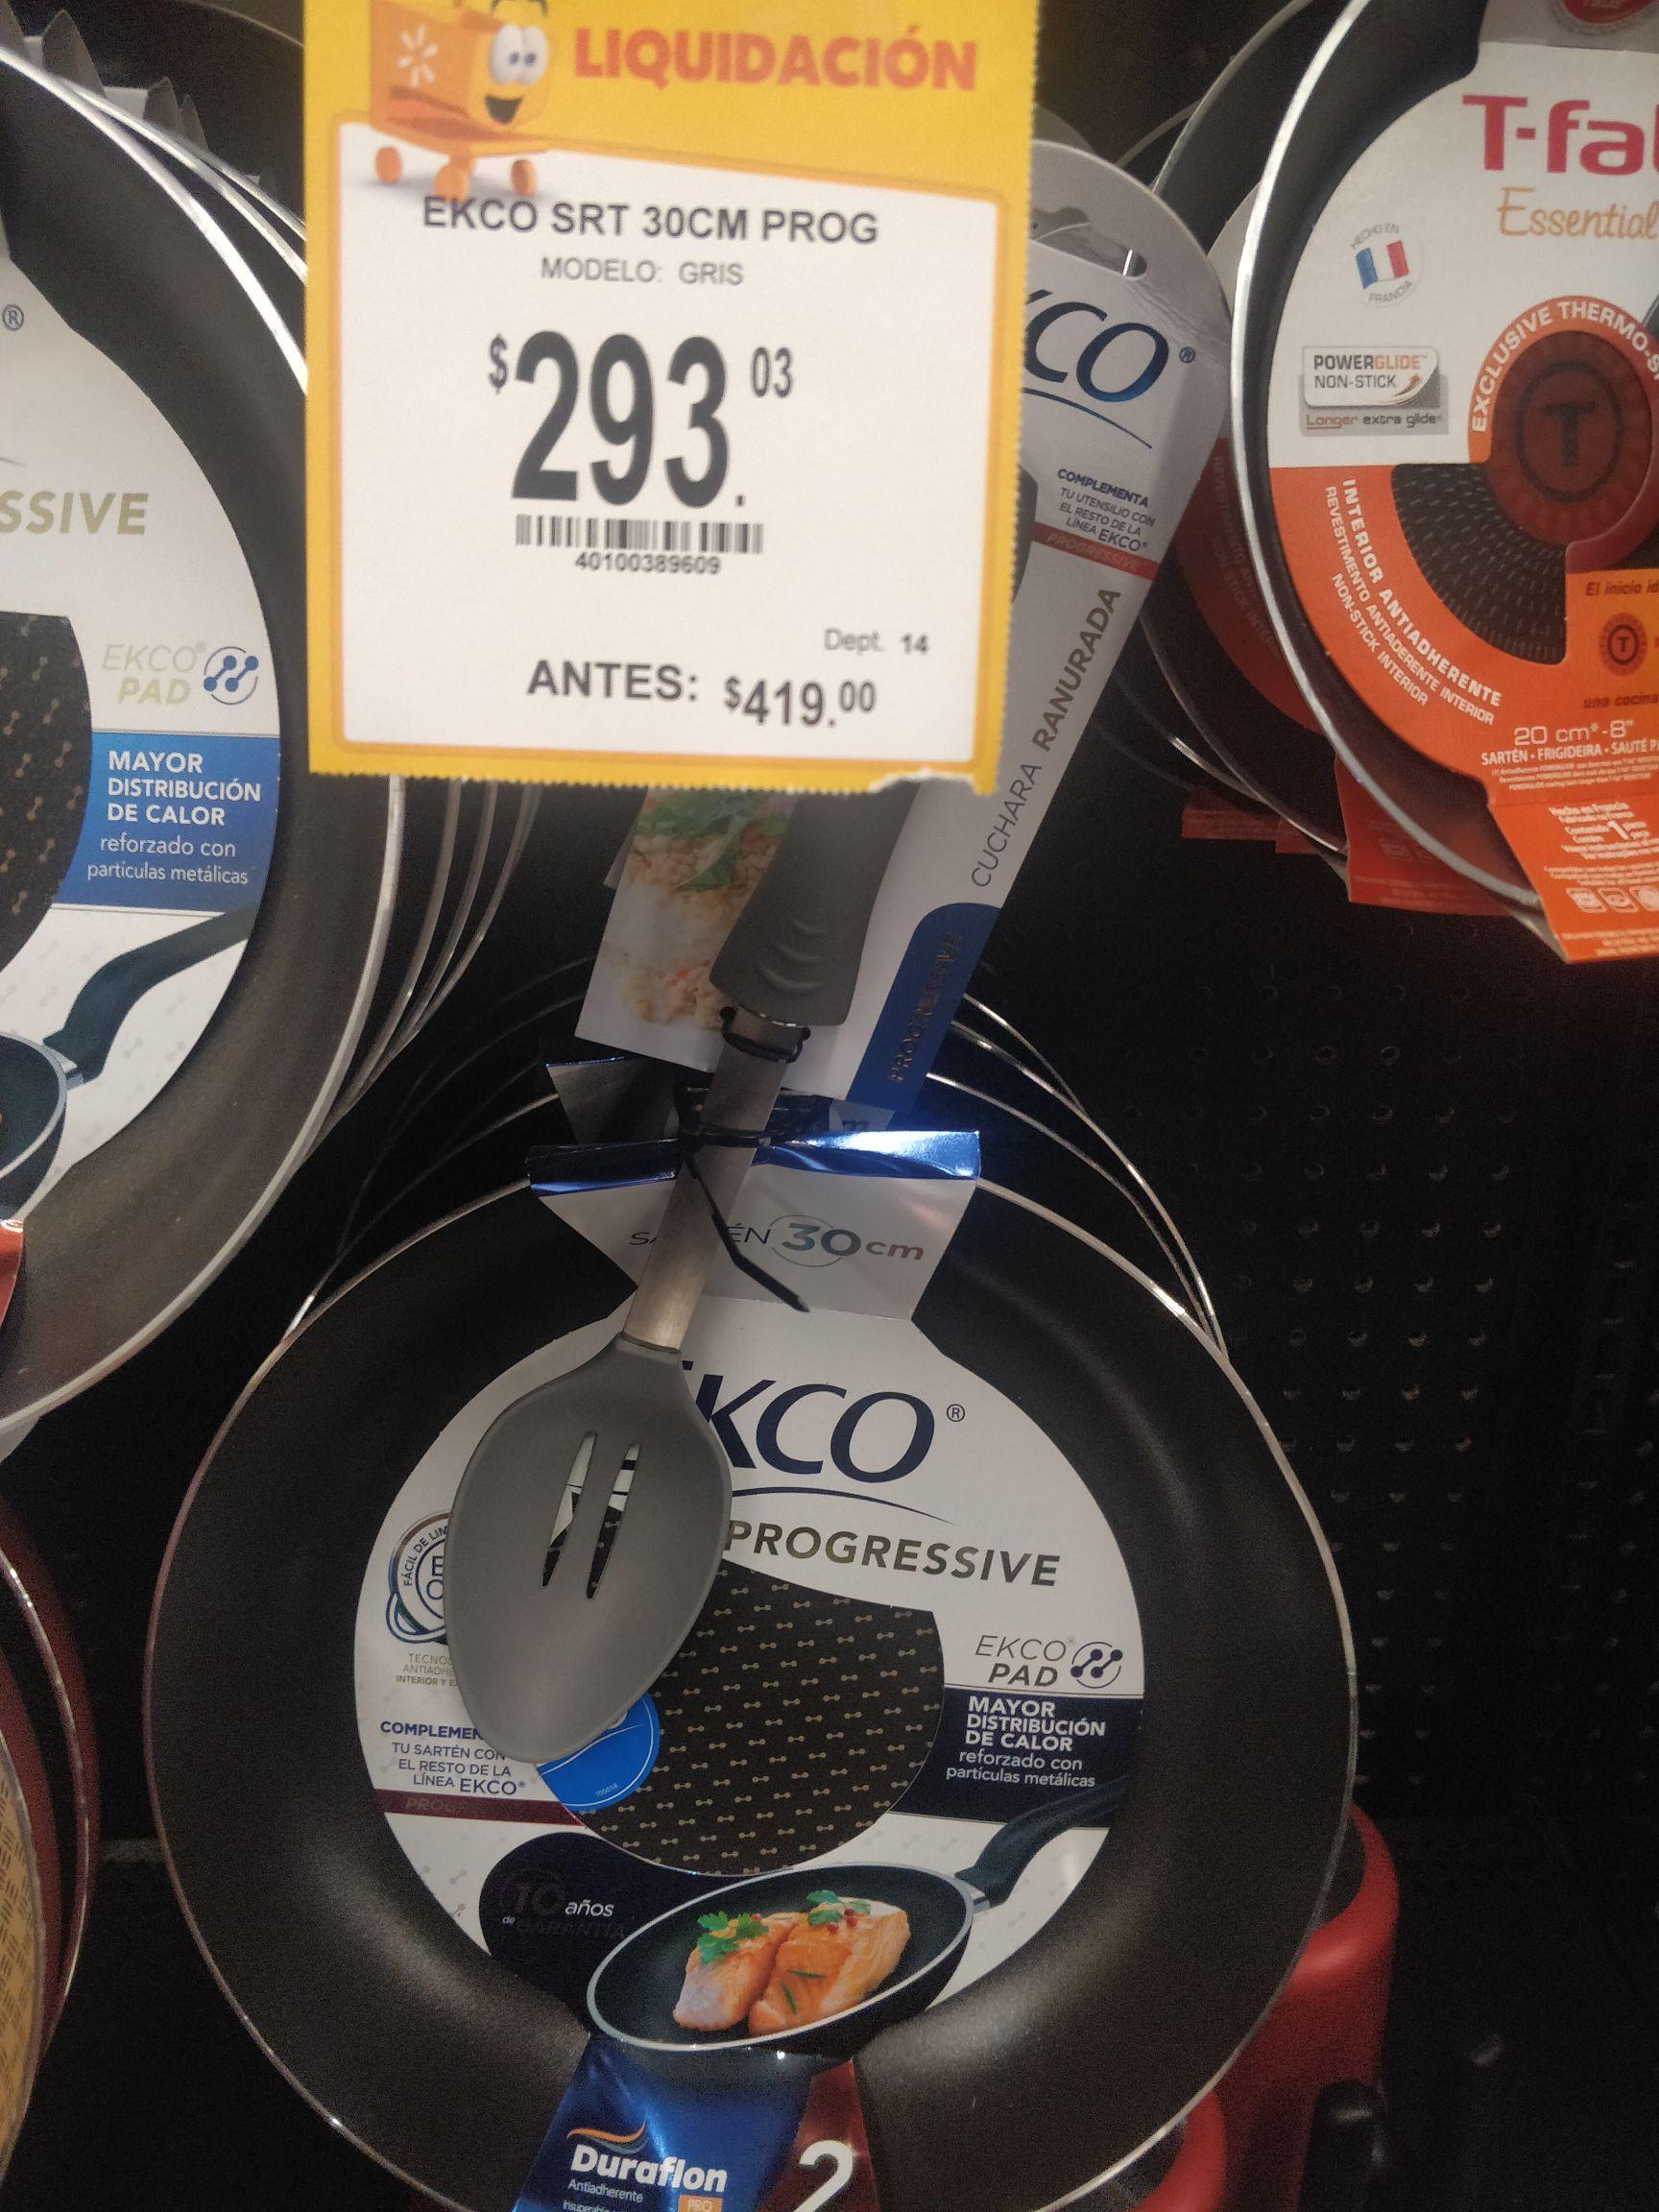 Walmart: Sartén Ecko 30cm